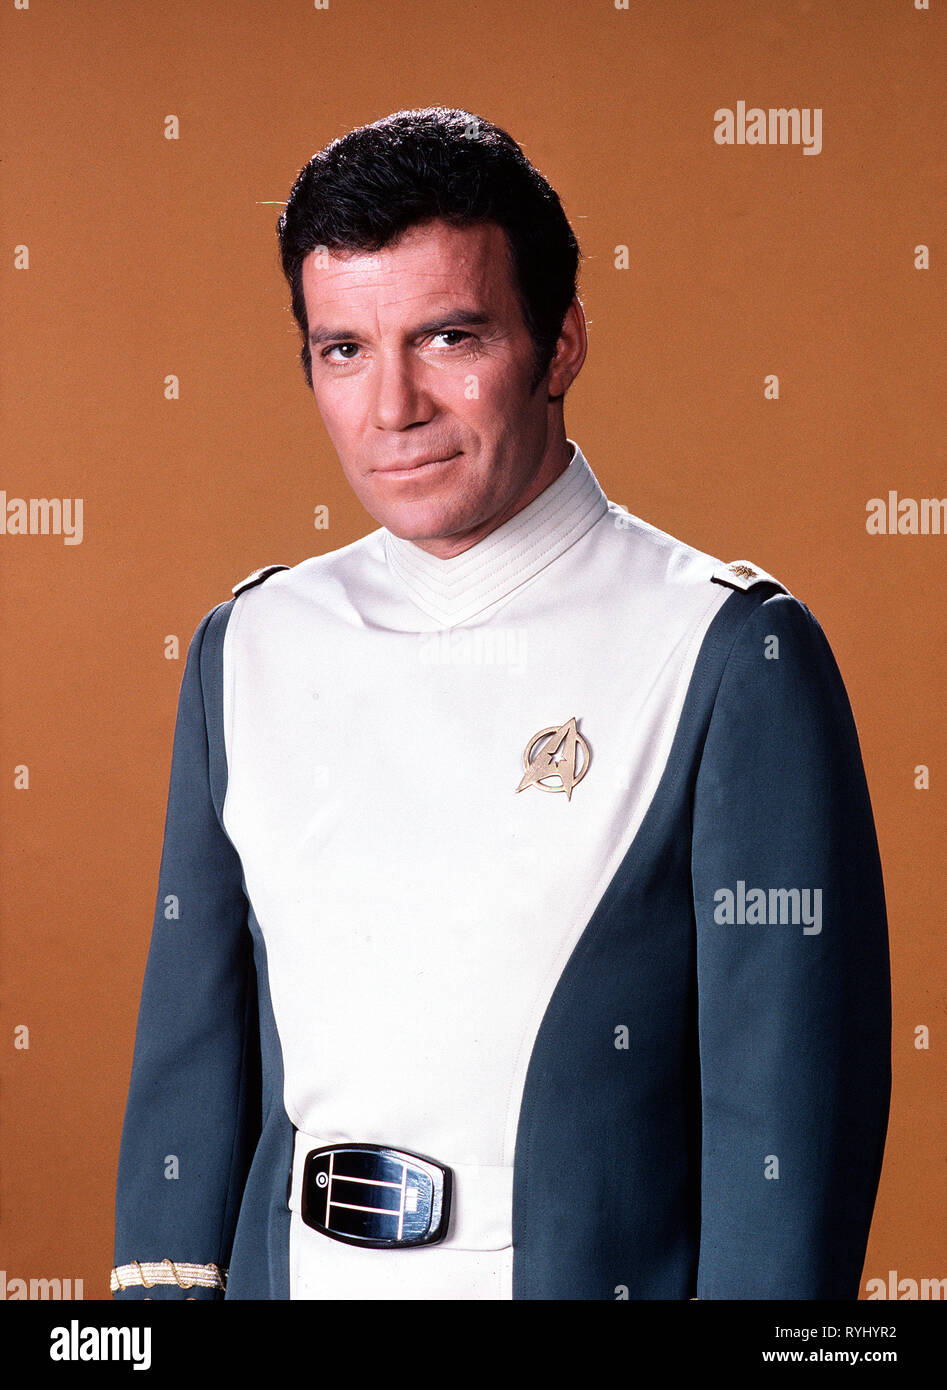 WILLIAM SHATNER, STAR TREK: THE MOTION PICTURE, 1979 Stock Photo